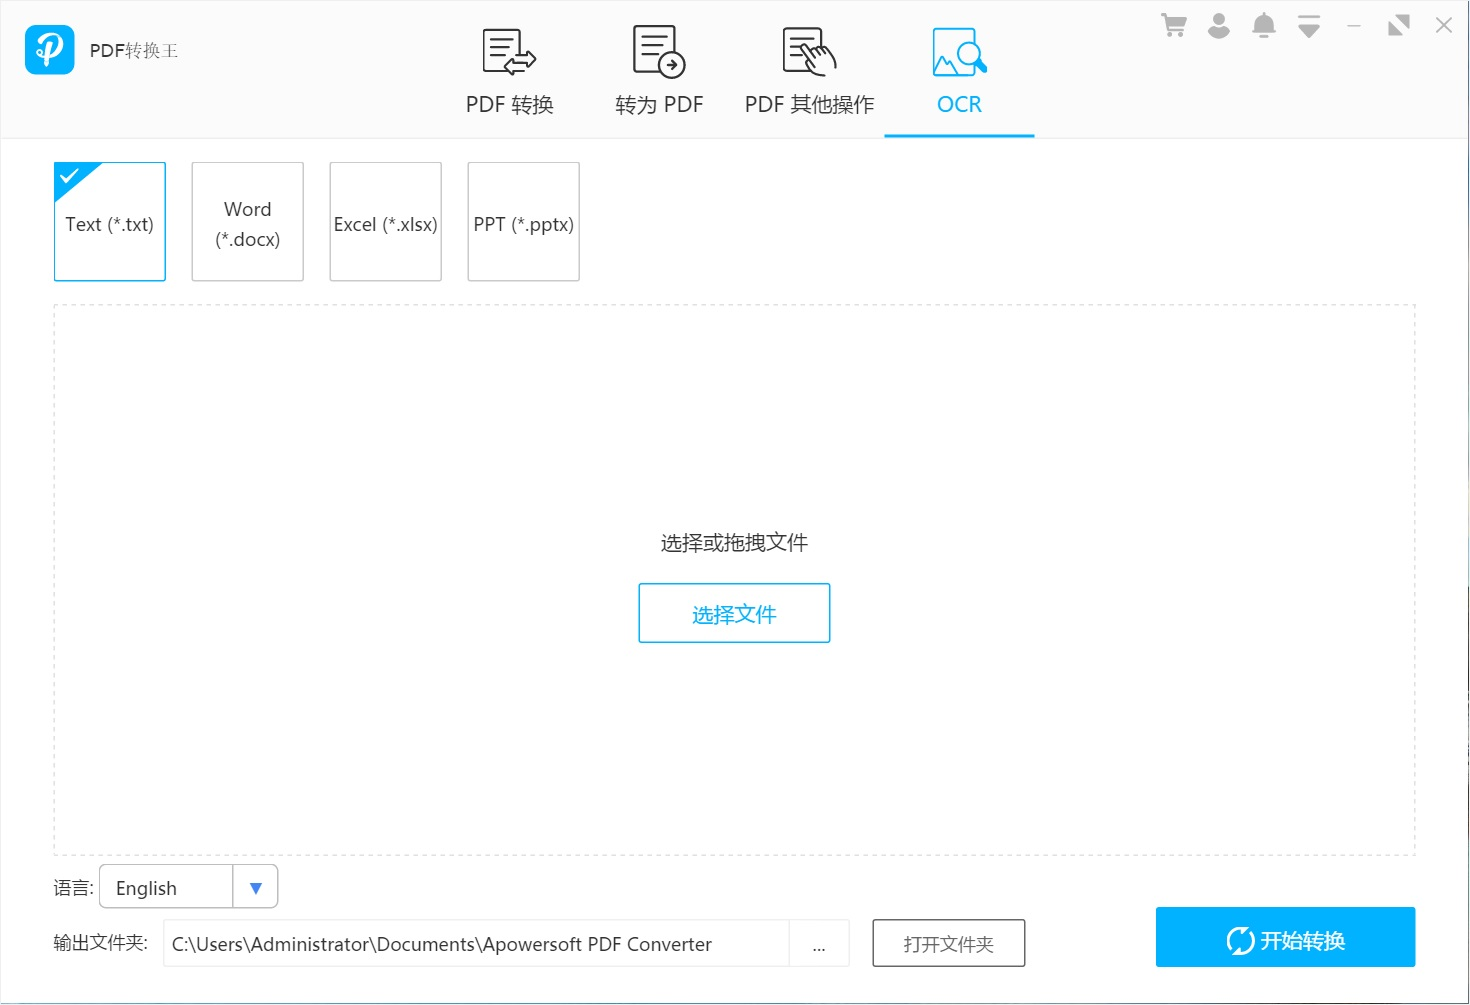 Apowersoft PDF Converter 2.2.0.jpg